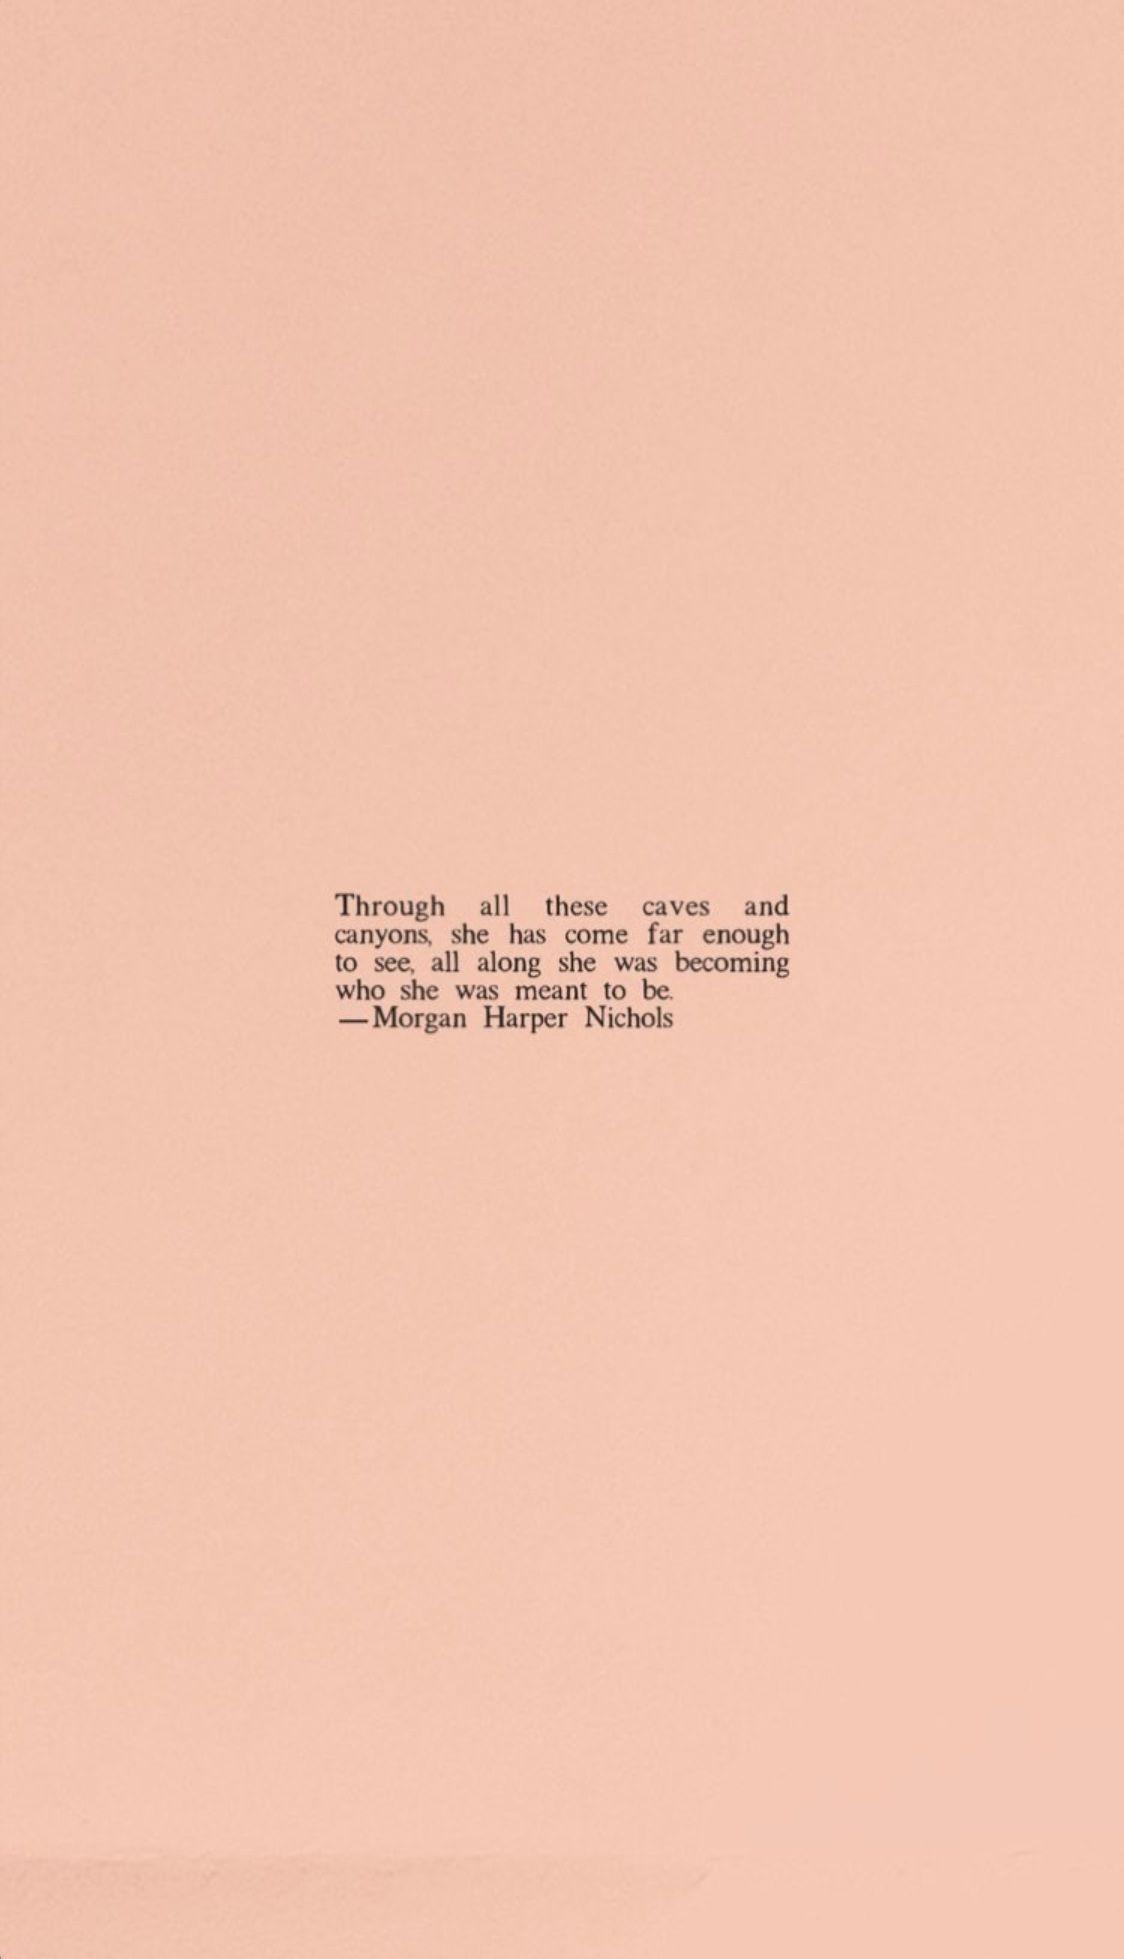 Pin Oleh Megan Harding Di Words And Quotes Kata Kata Kutipan Motivasi Inspirasional